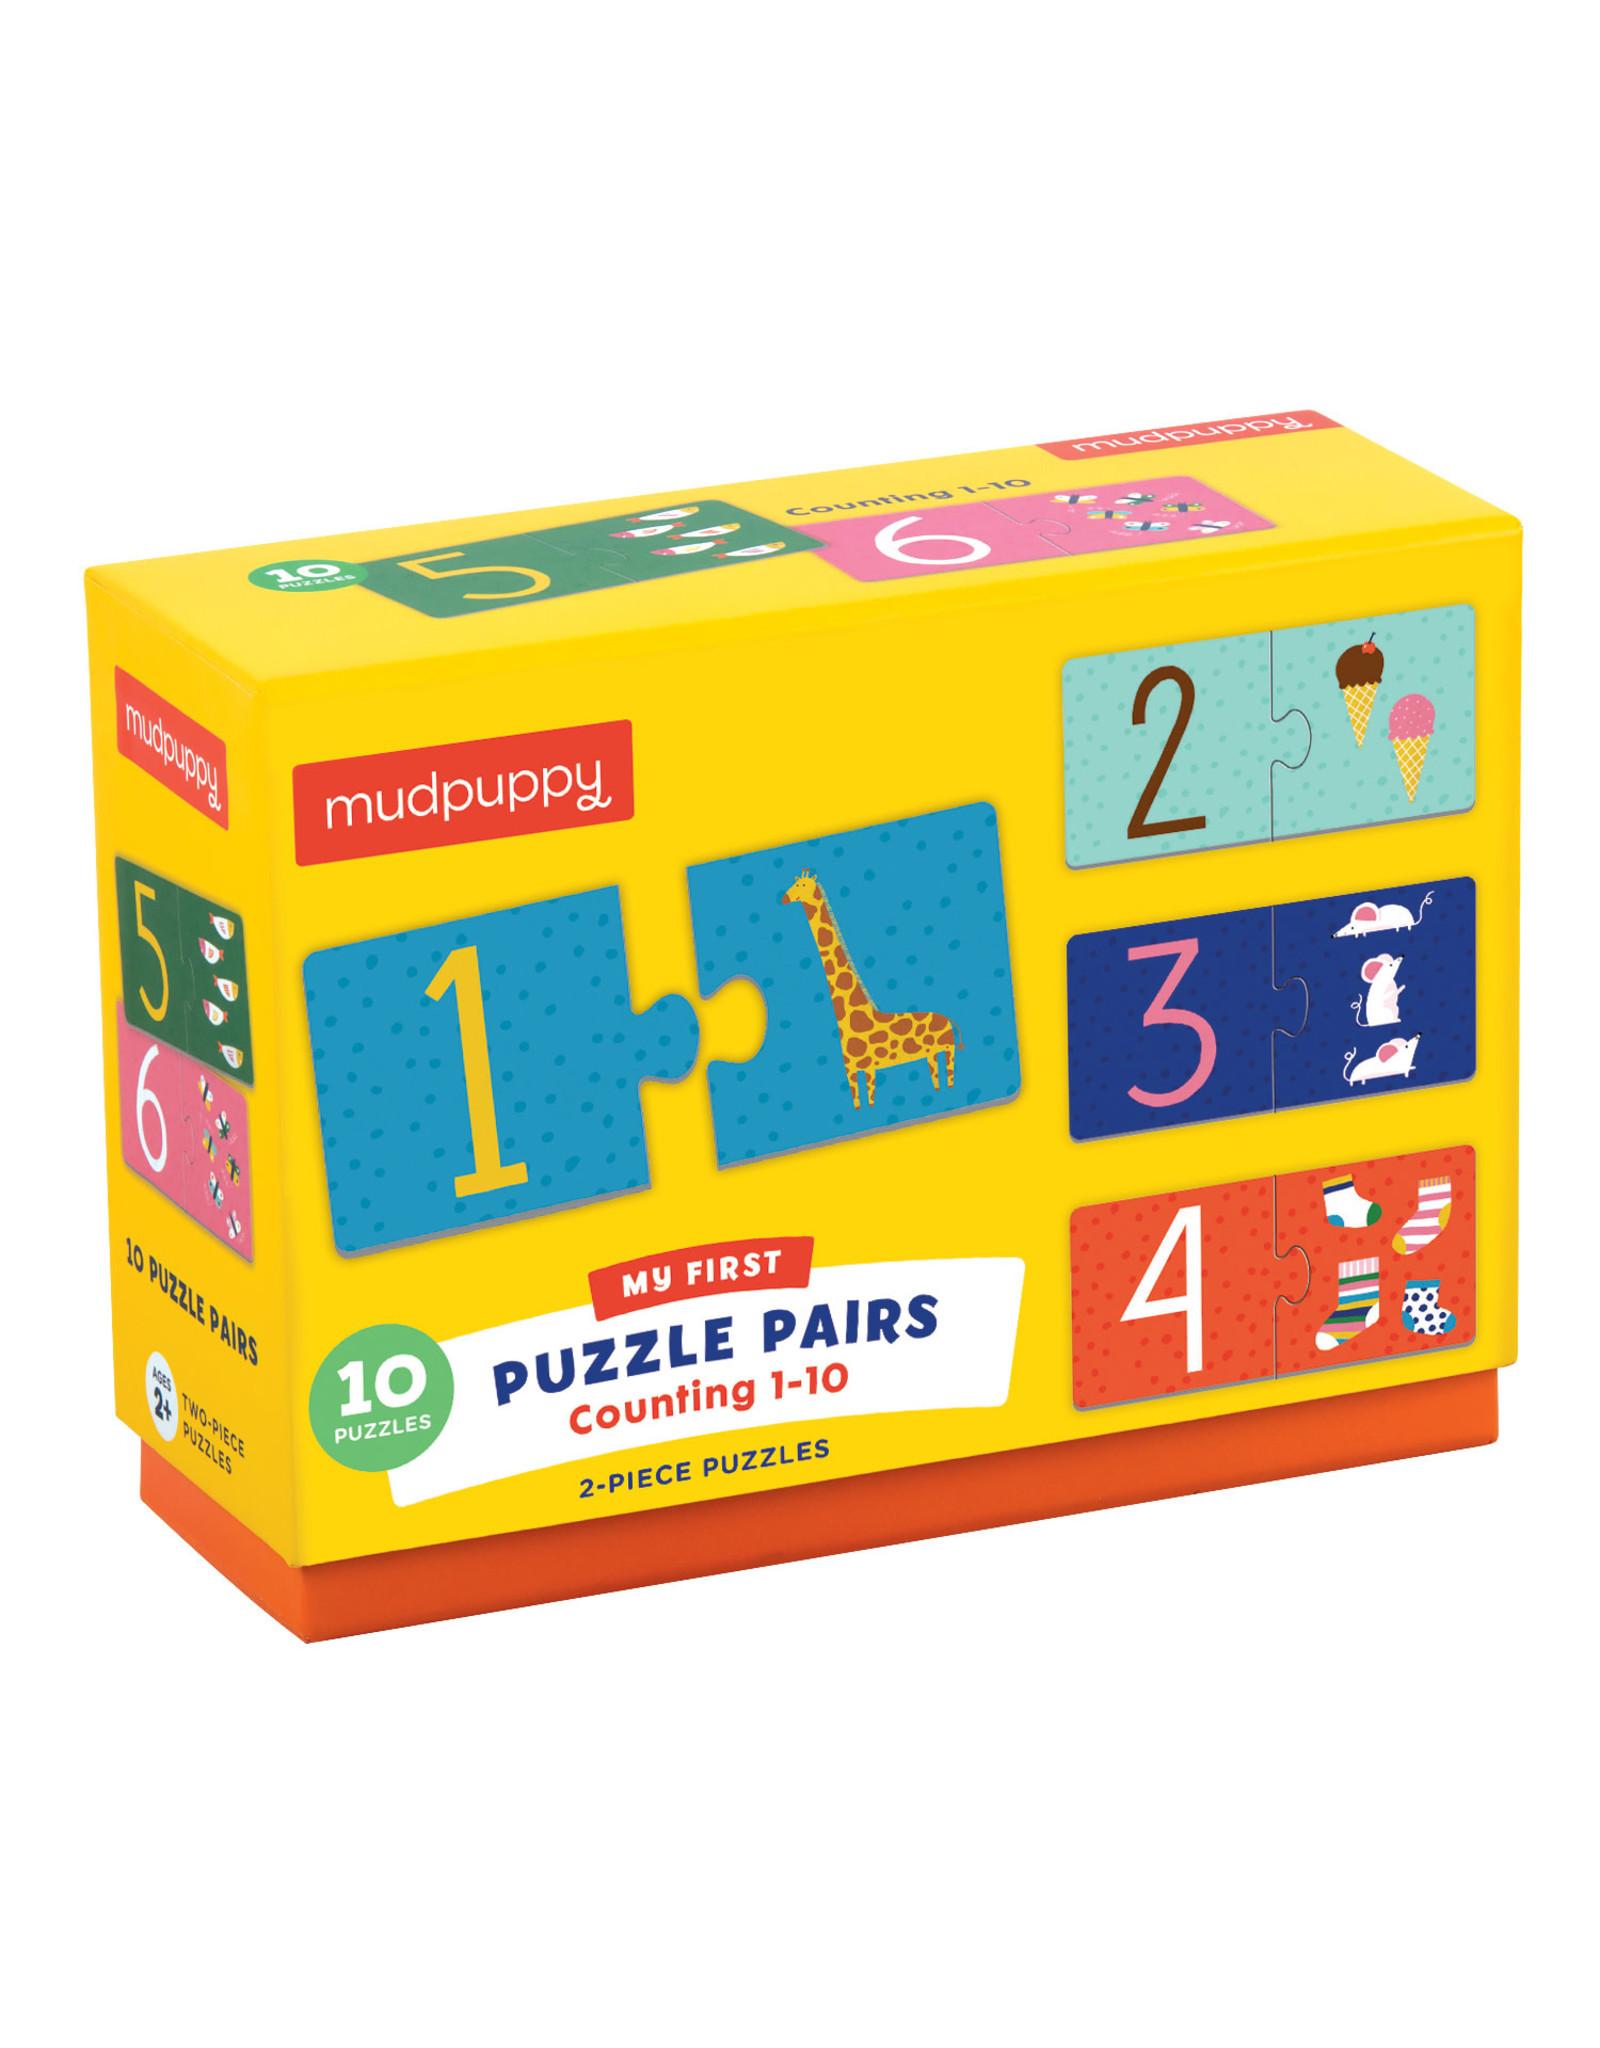 Mudpuppy Counting 1-10 10 x 2pc